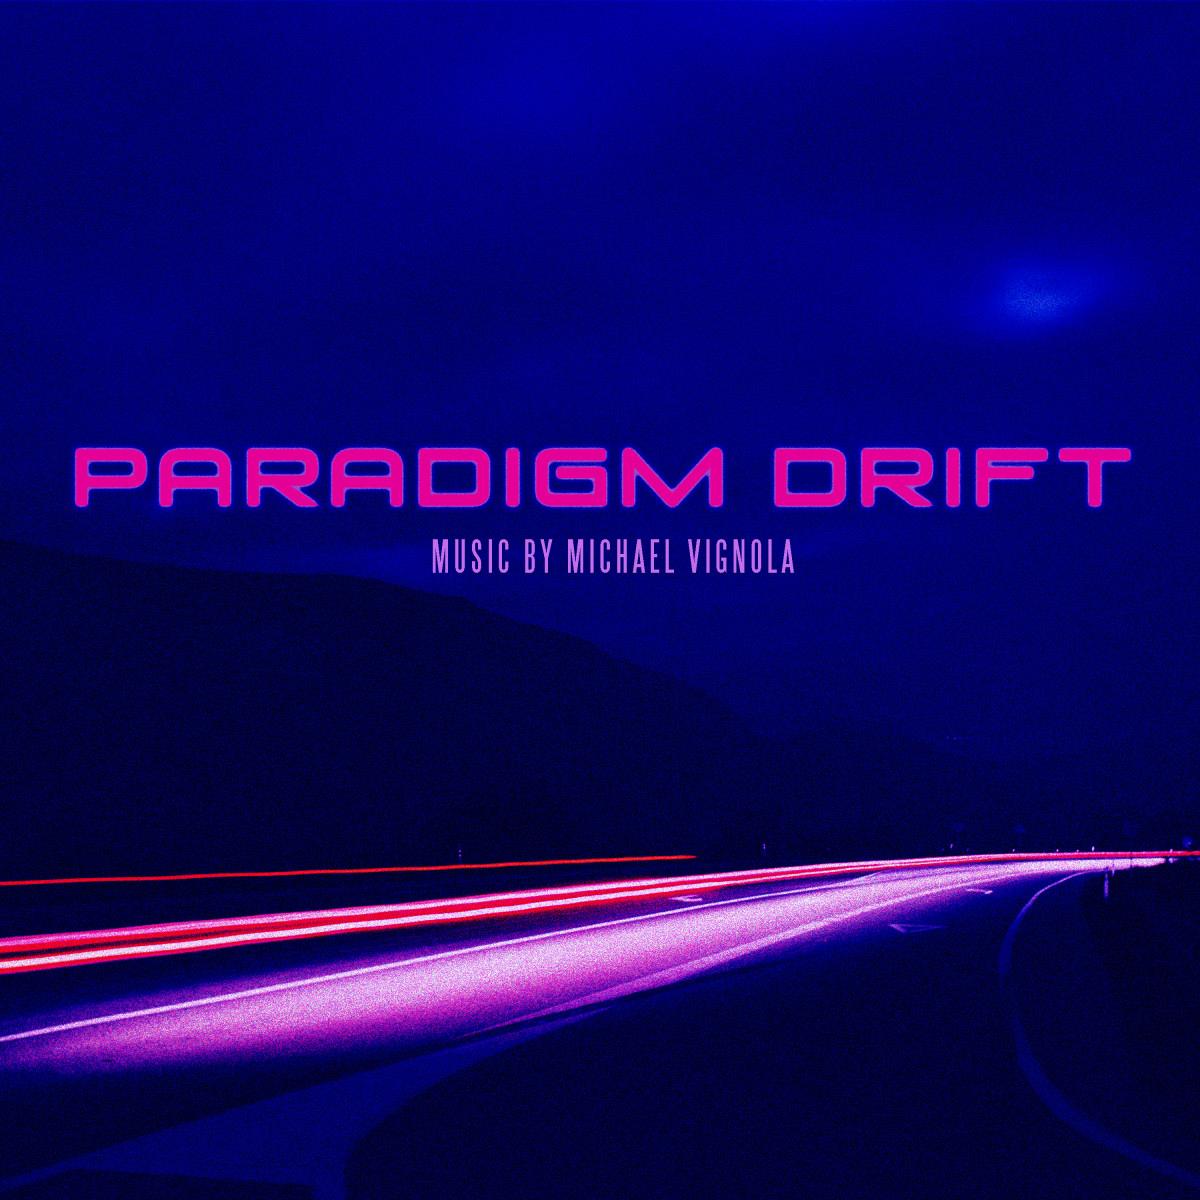 Album Review: Paradigm Drift by Michael Vignola